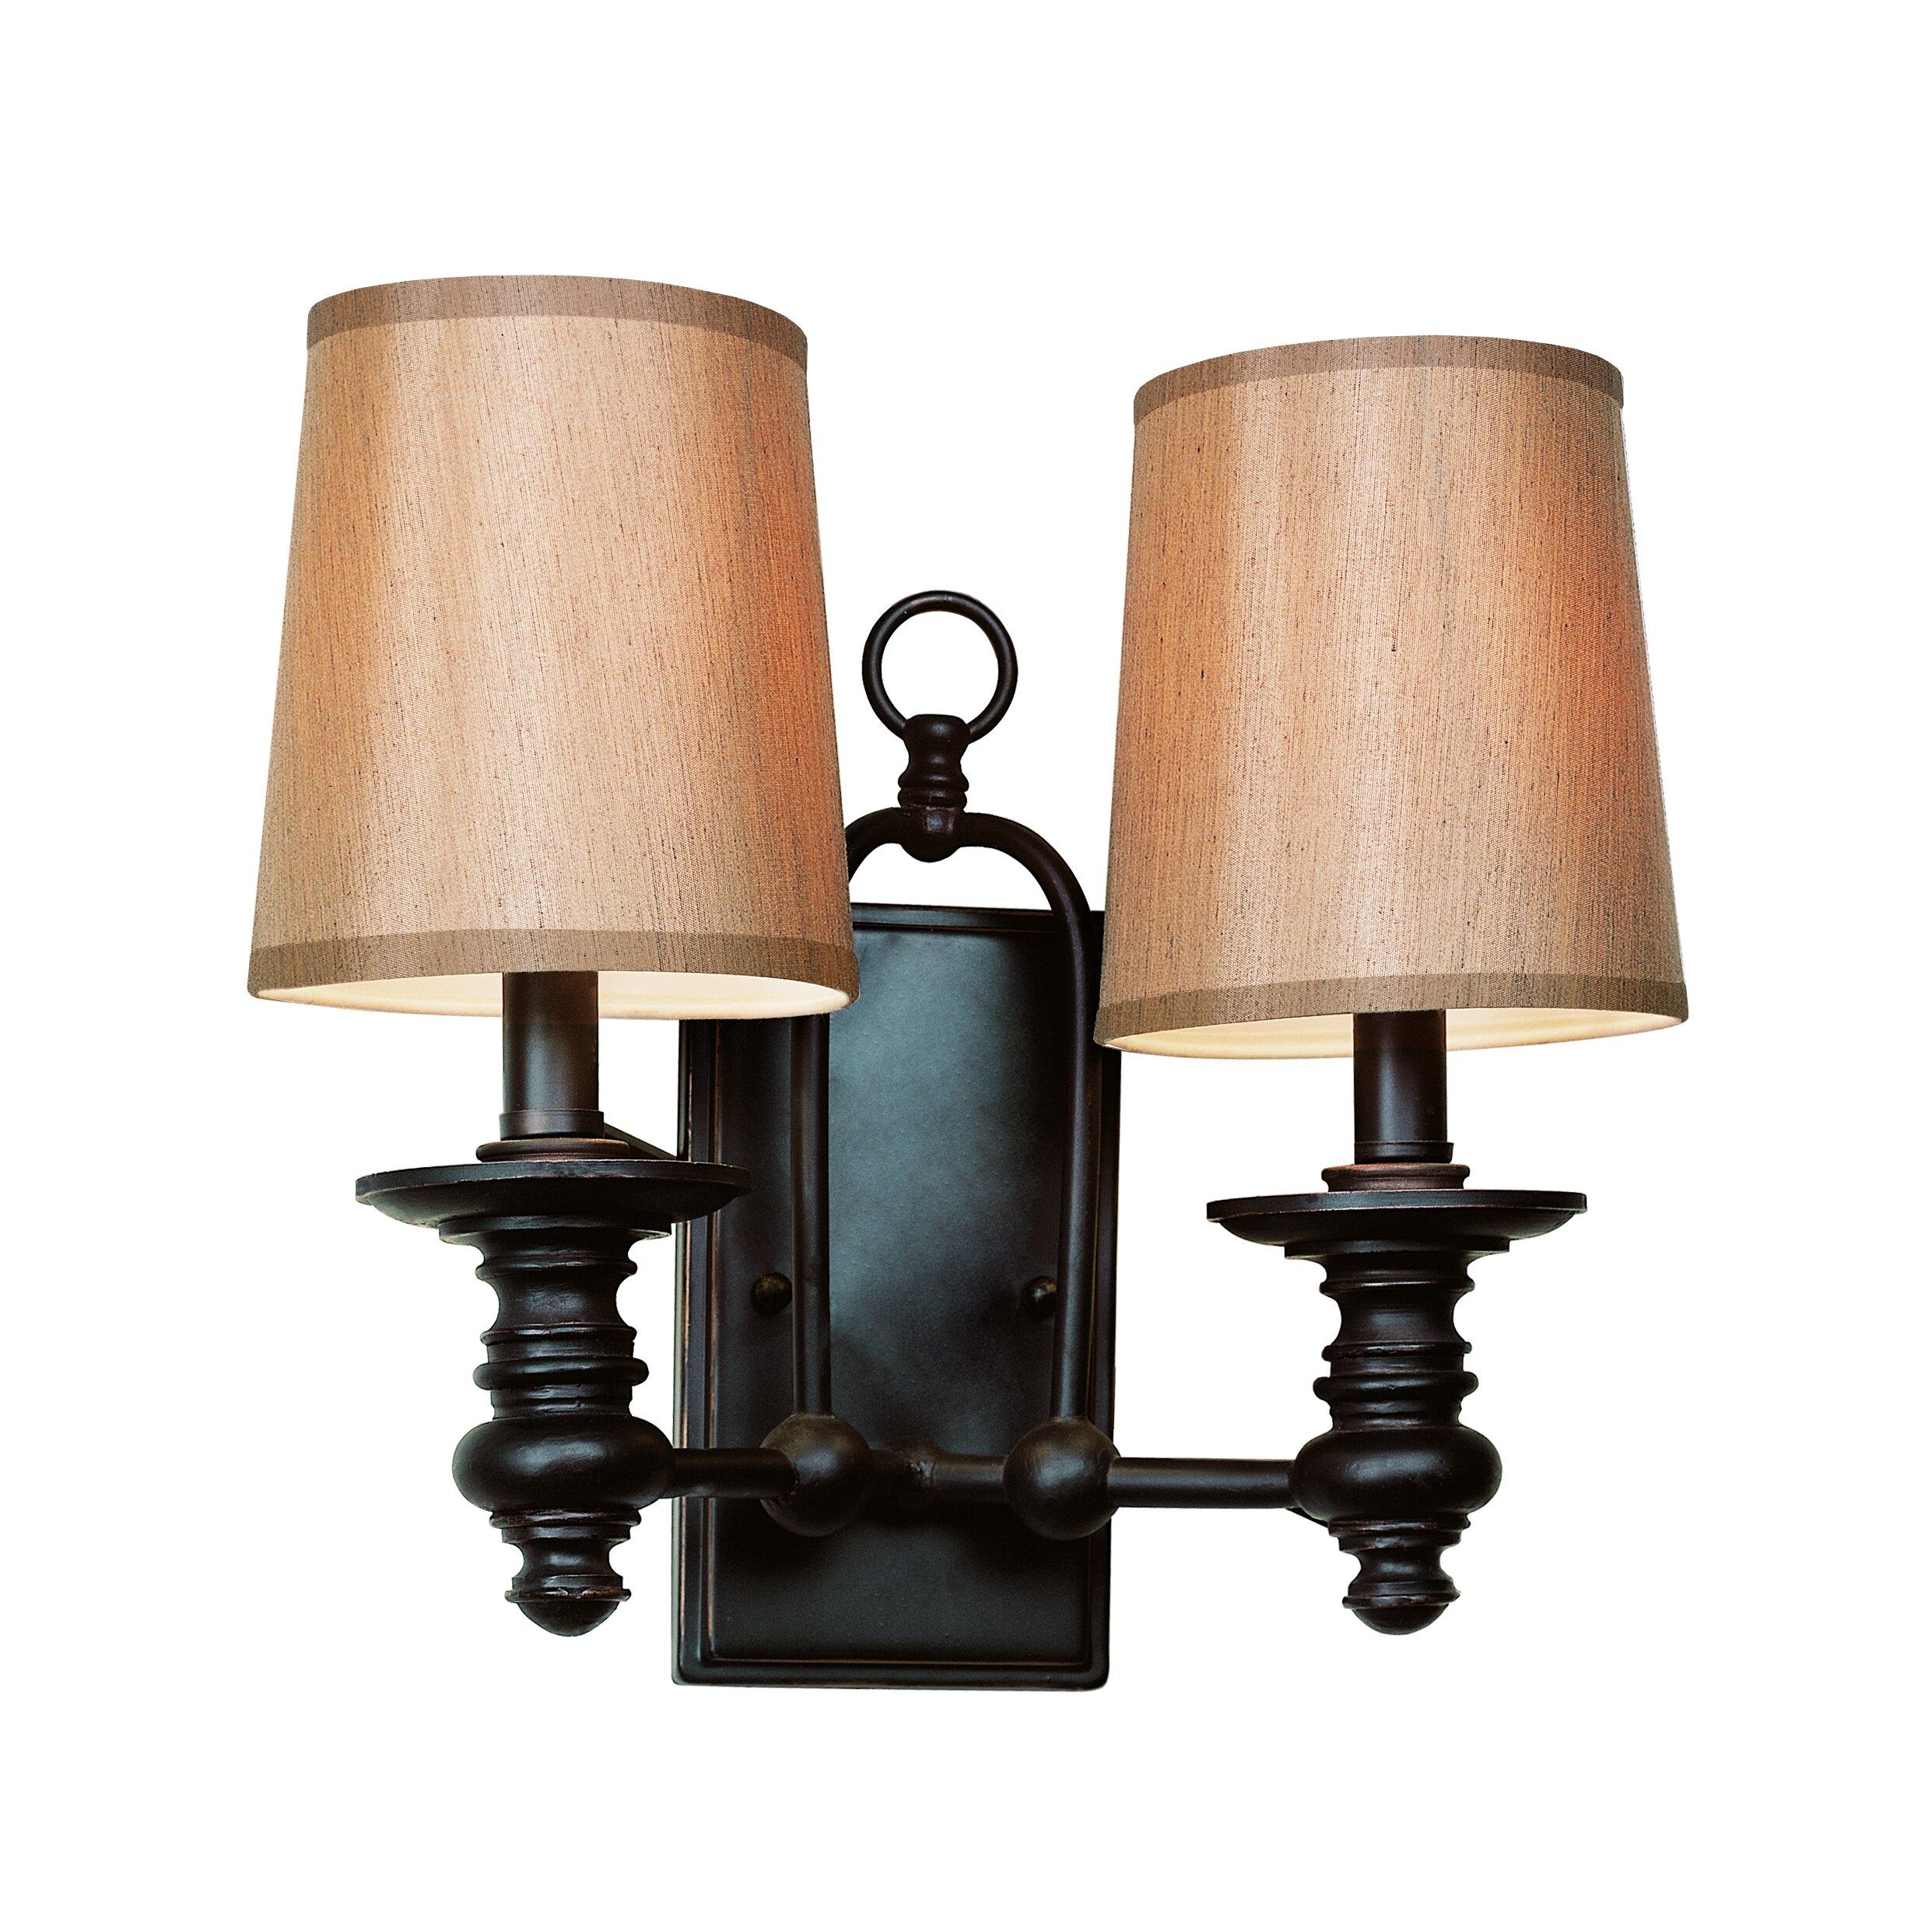 Transglobe Lighting Modern Meets Traditional 2 Light Wall